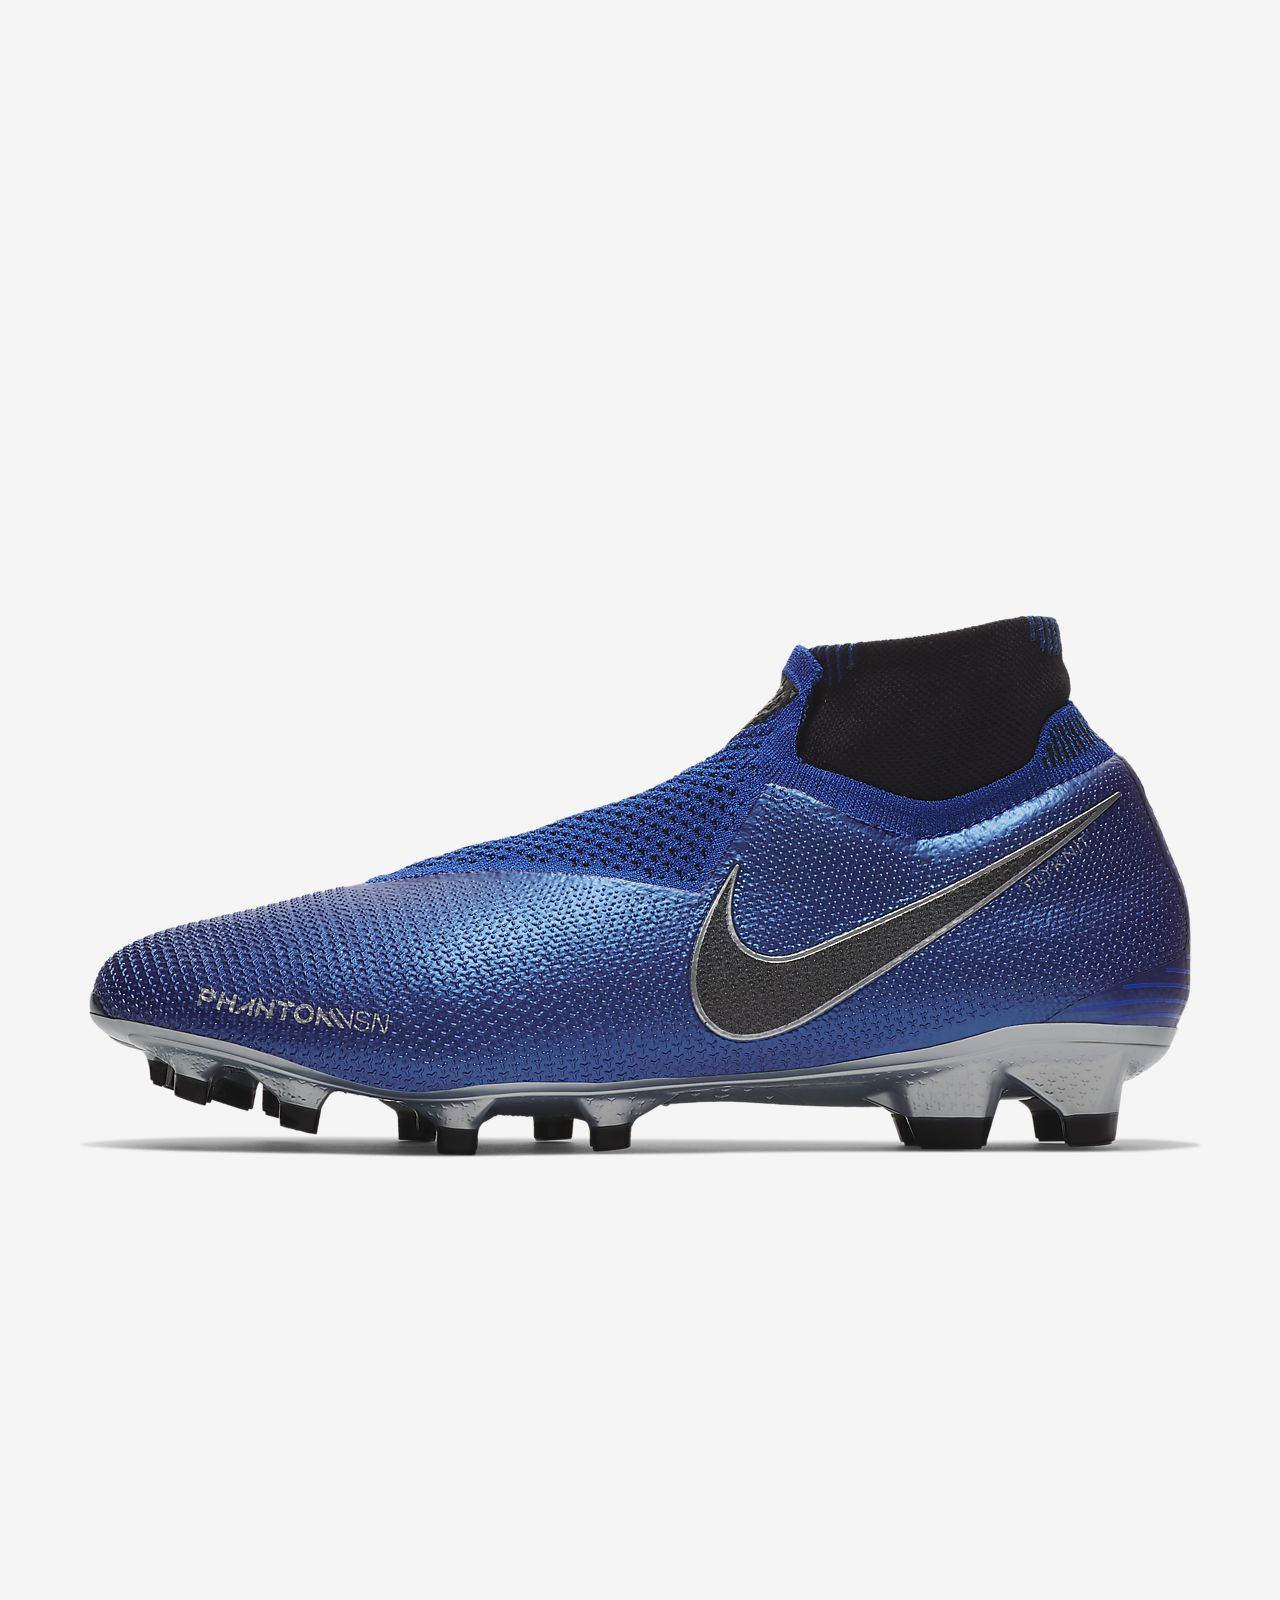 ... Scarpa da calcio per terreni duri Nike PhantomVSN Elite Dynamic Fit FG 1639c7e1208